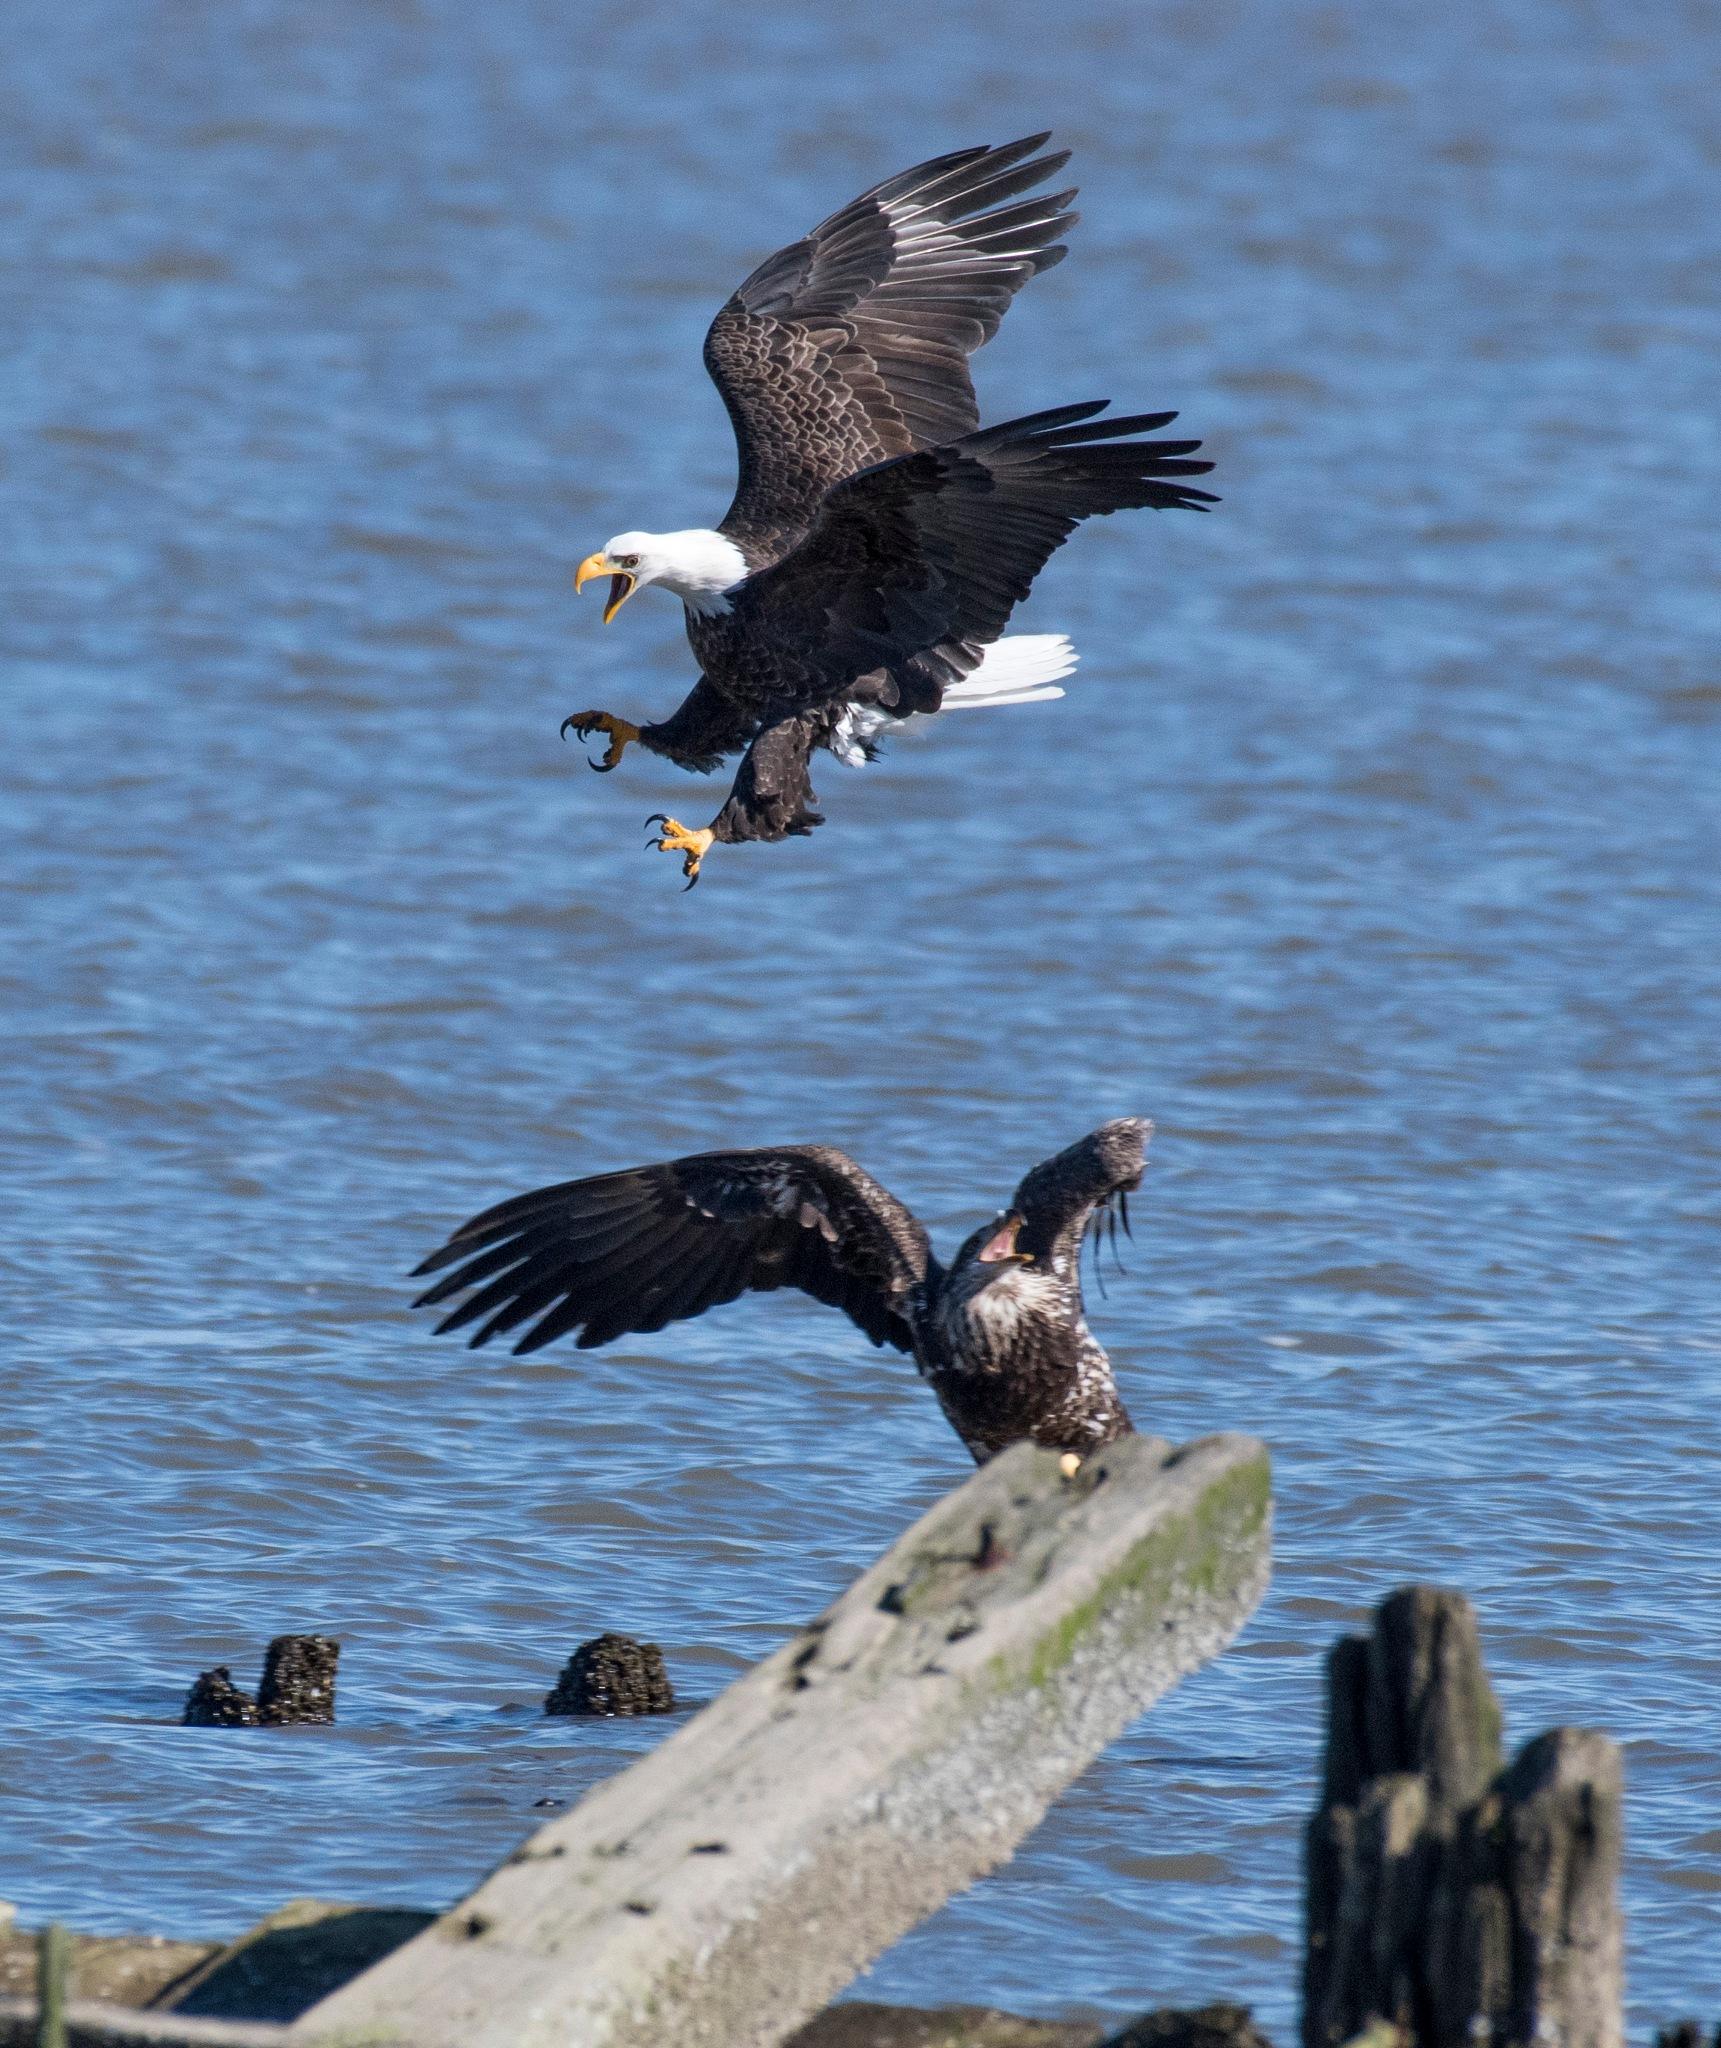 Screaming Eagle by Tommy Slane